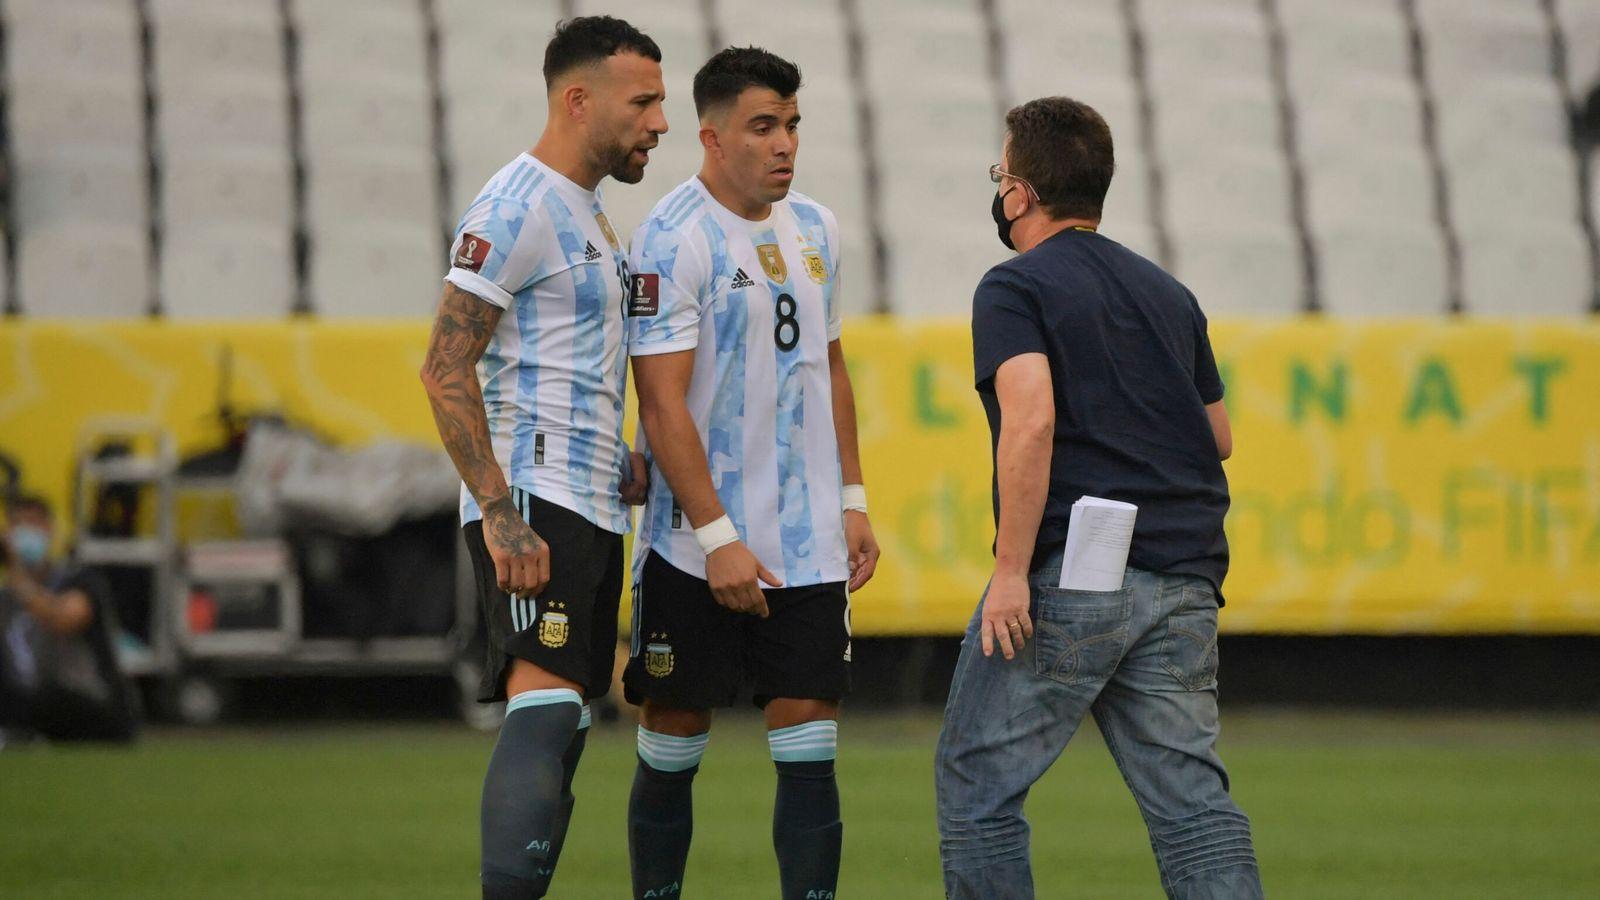 Beberapa pemain Argentina treprovokasi oleh petugas yang masuk saat pertandingan berlangsung